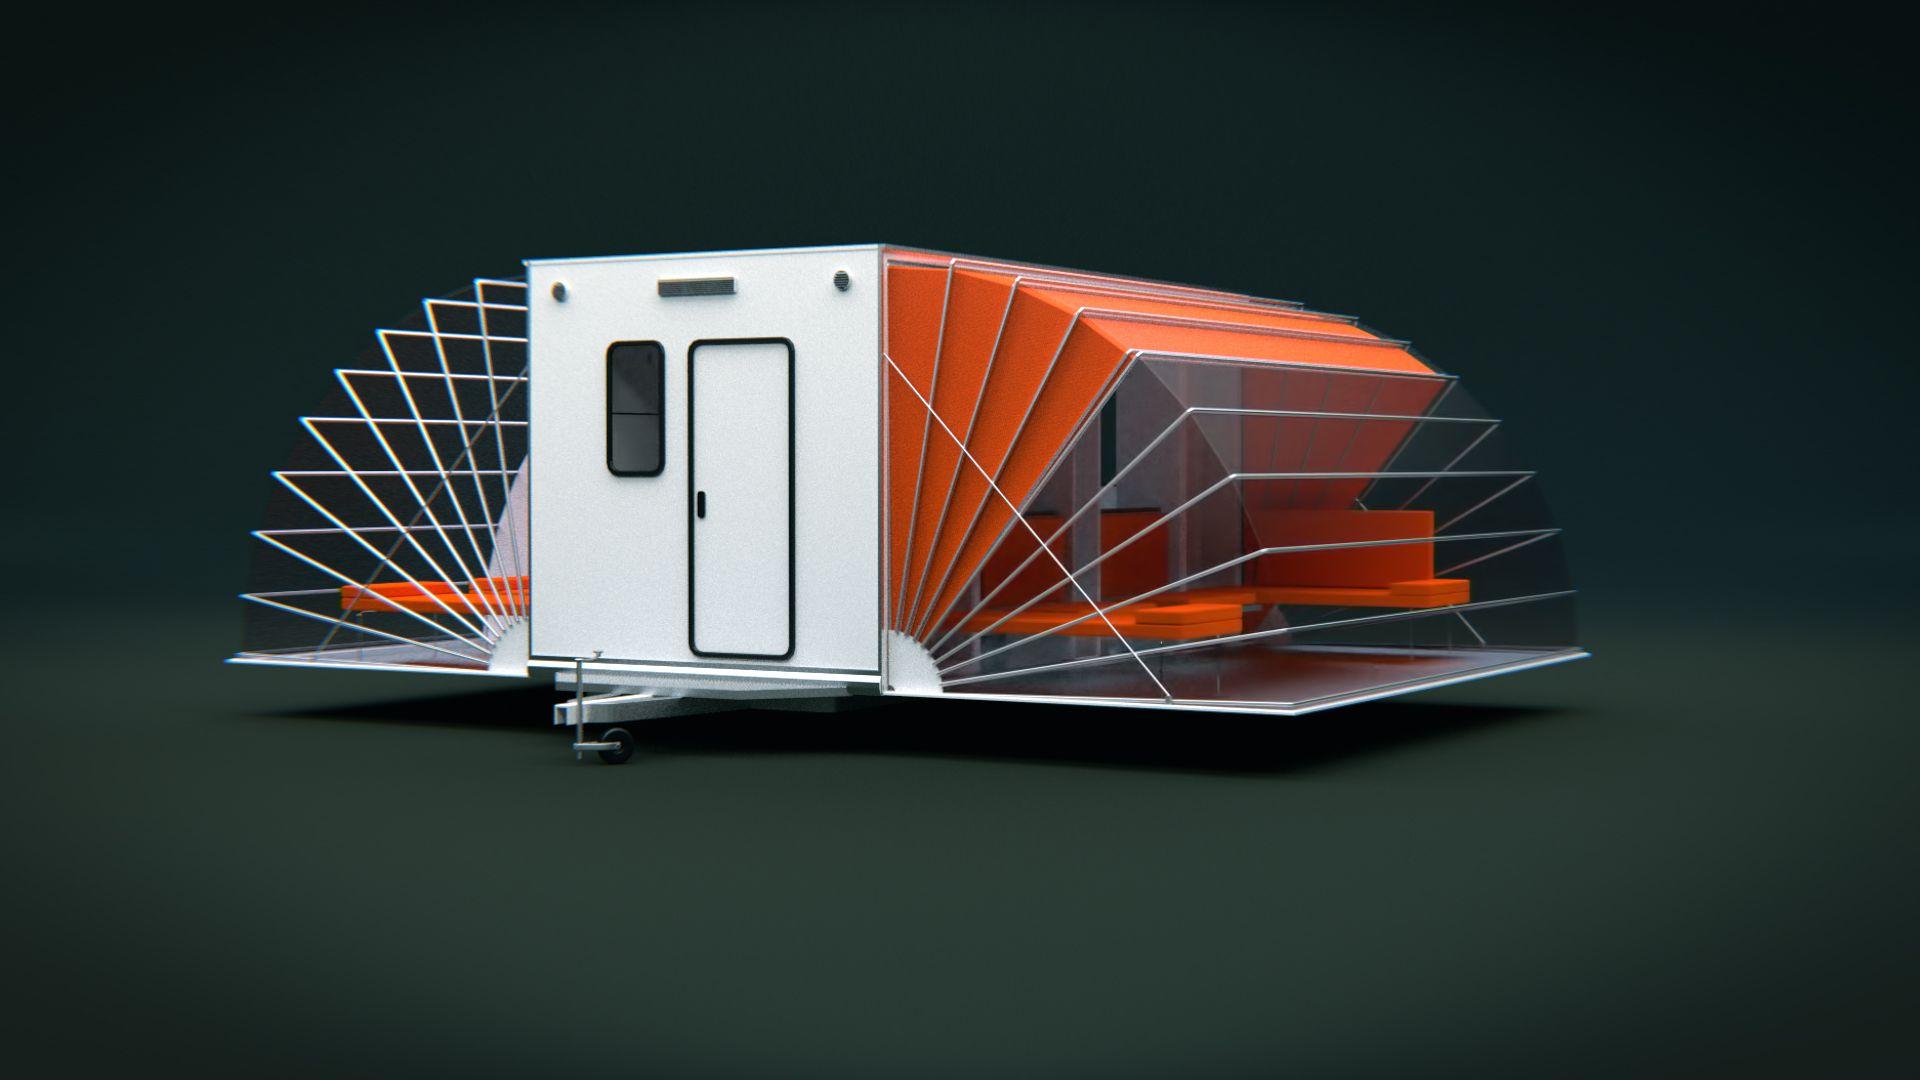 benjamin sohn product design compositing 3d de. Black Bedroom Furniture Sets. Home Design Ideas